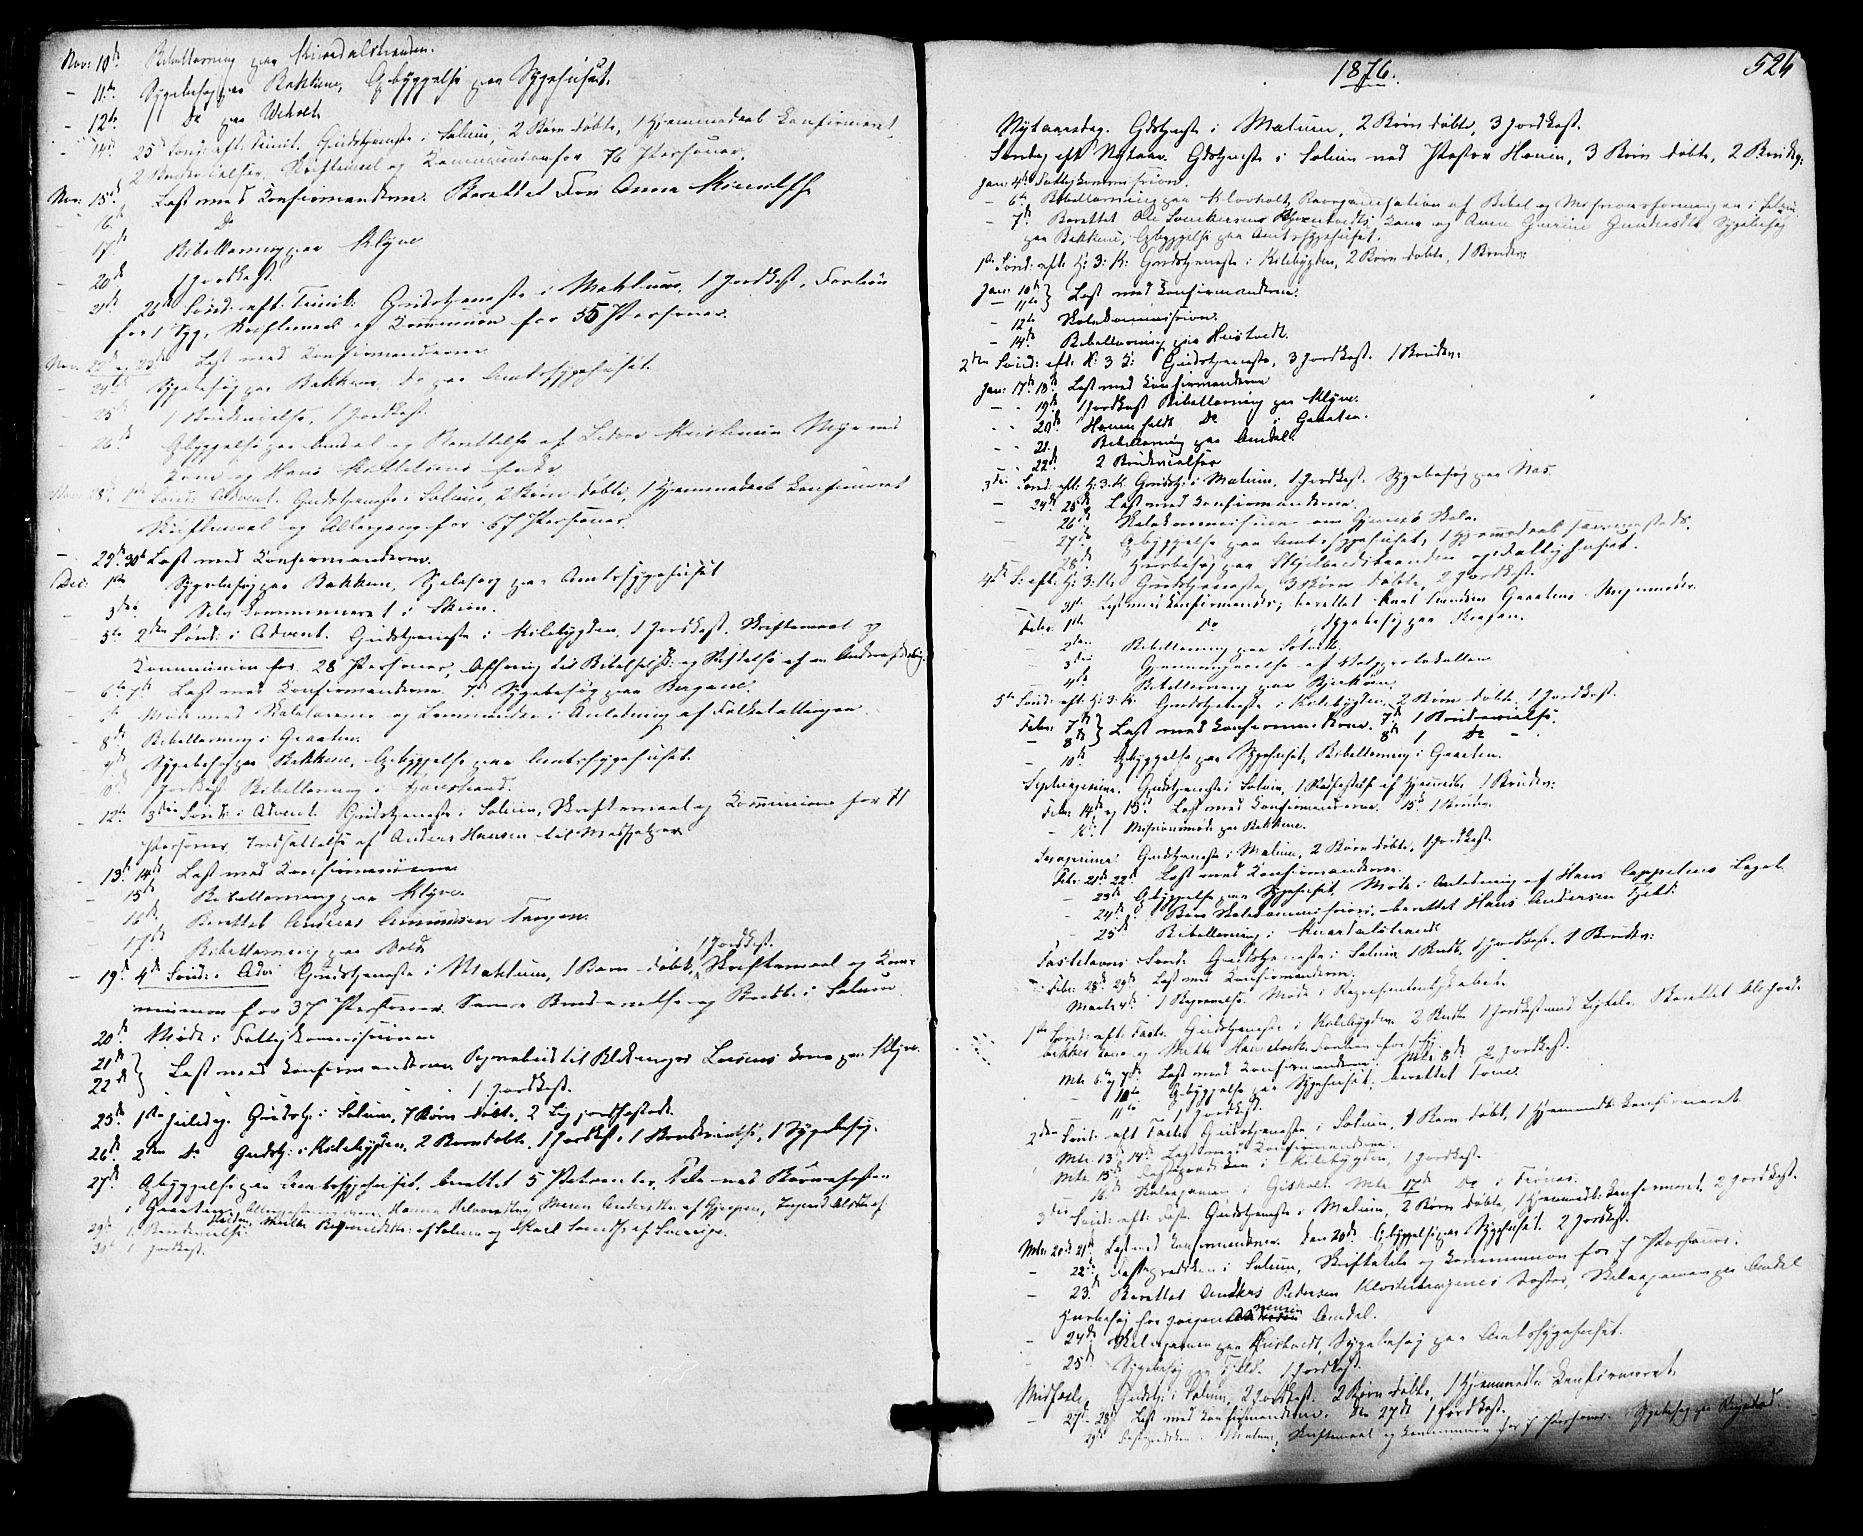 SAKO, Solum kirkebøker, F/Fa/L0008: Ministerialbok nr. I 8, 1865-1876, s. 526